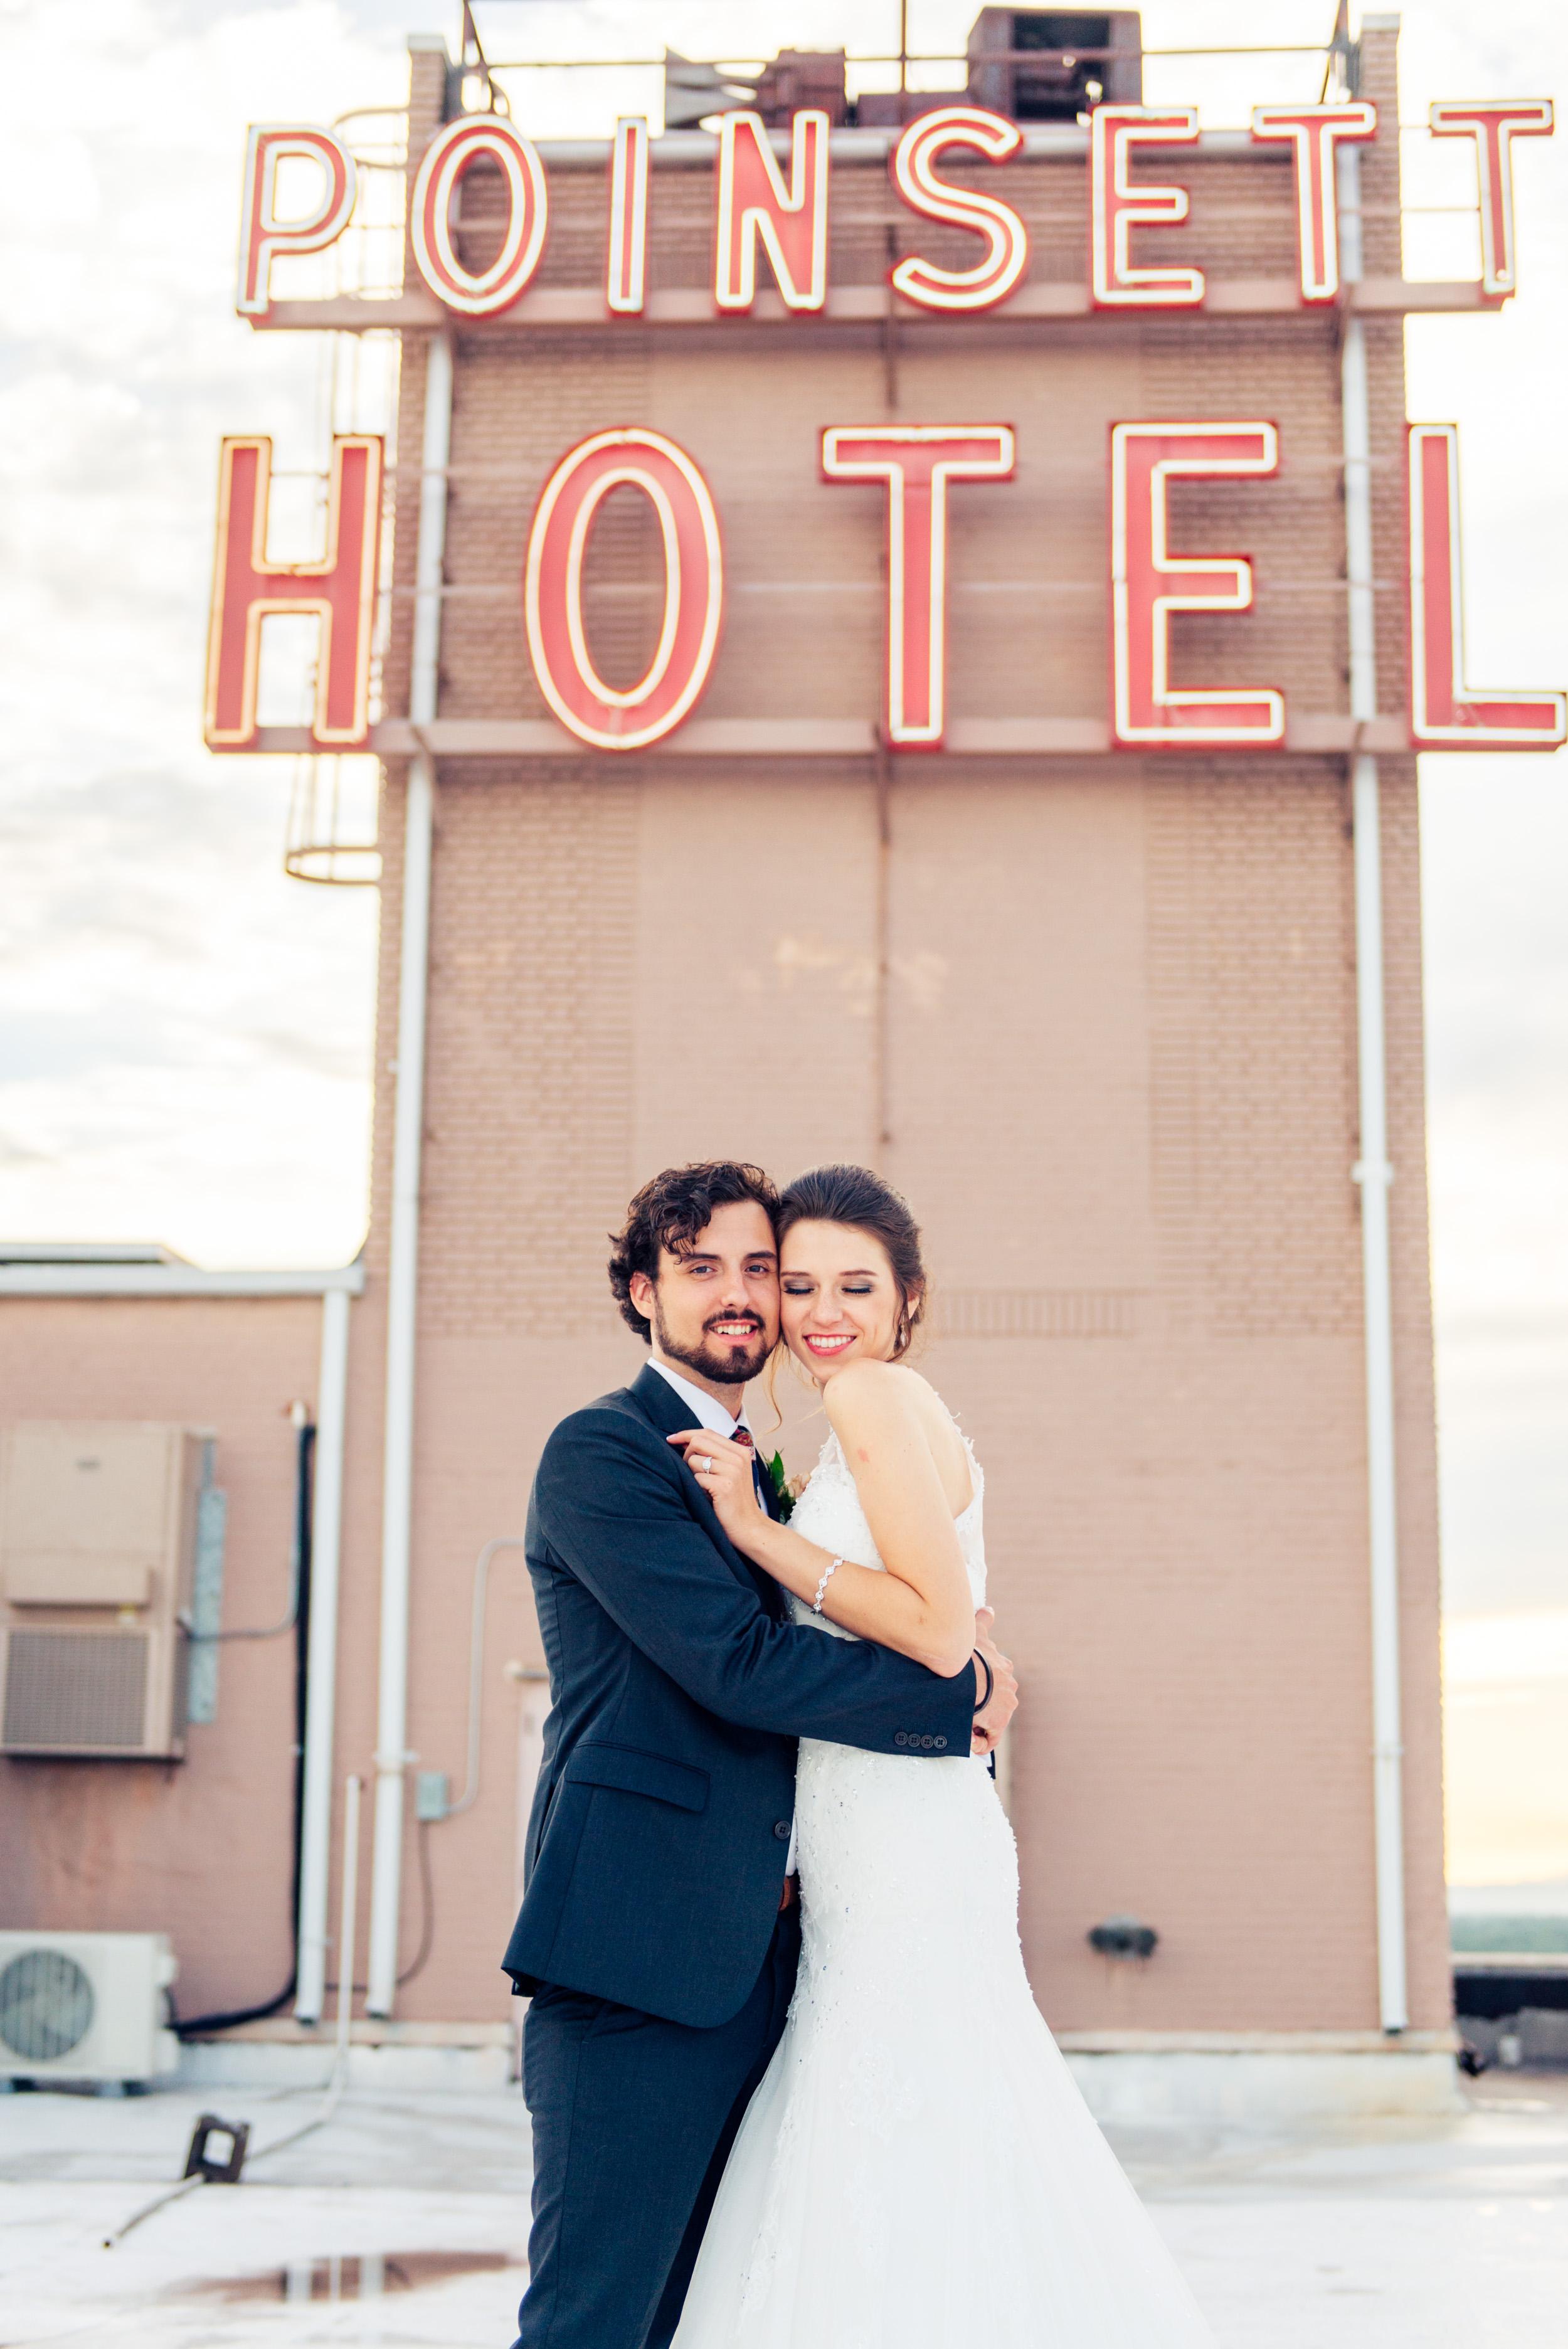 cleland-studios-wedding-photography-59.jpg